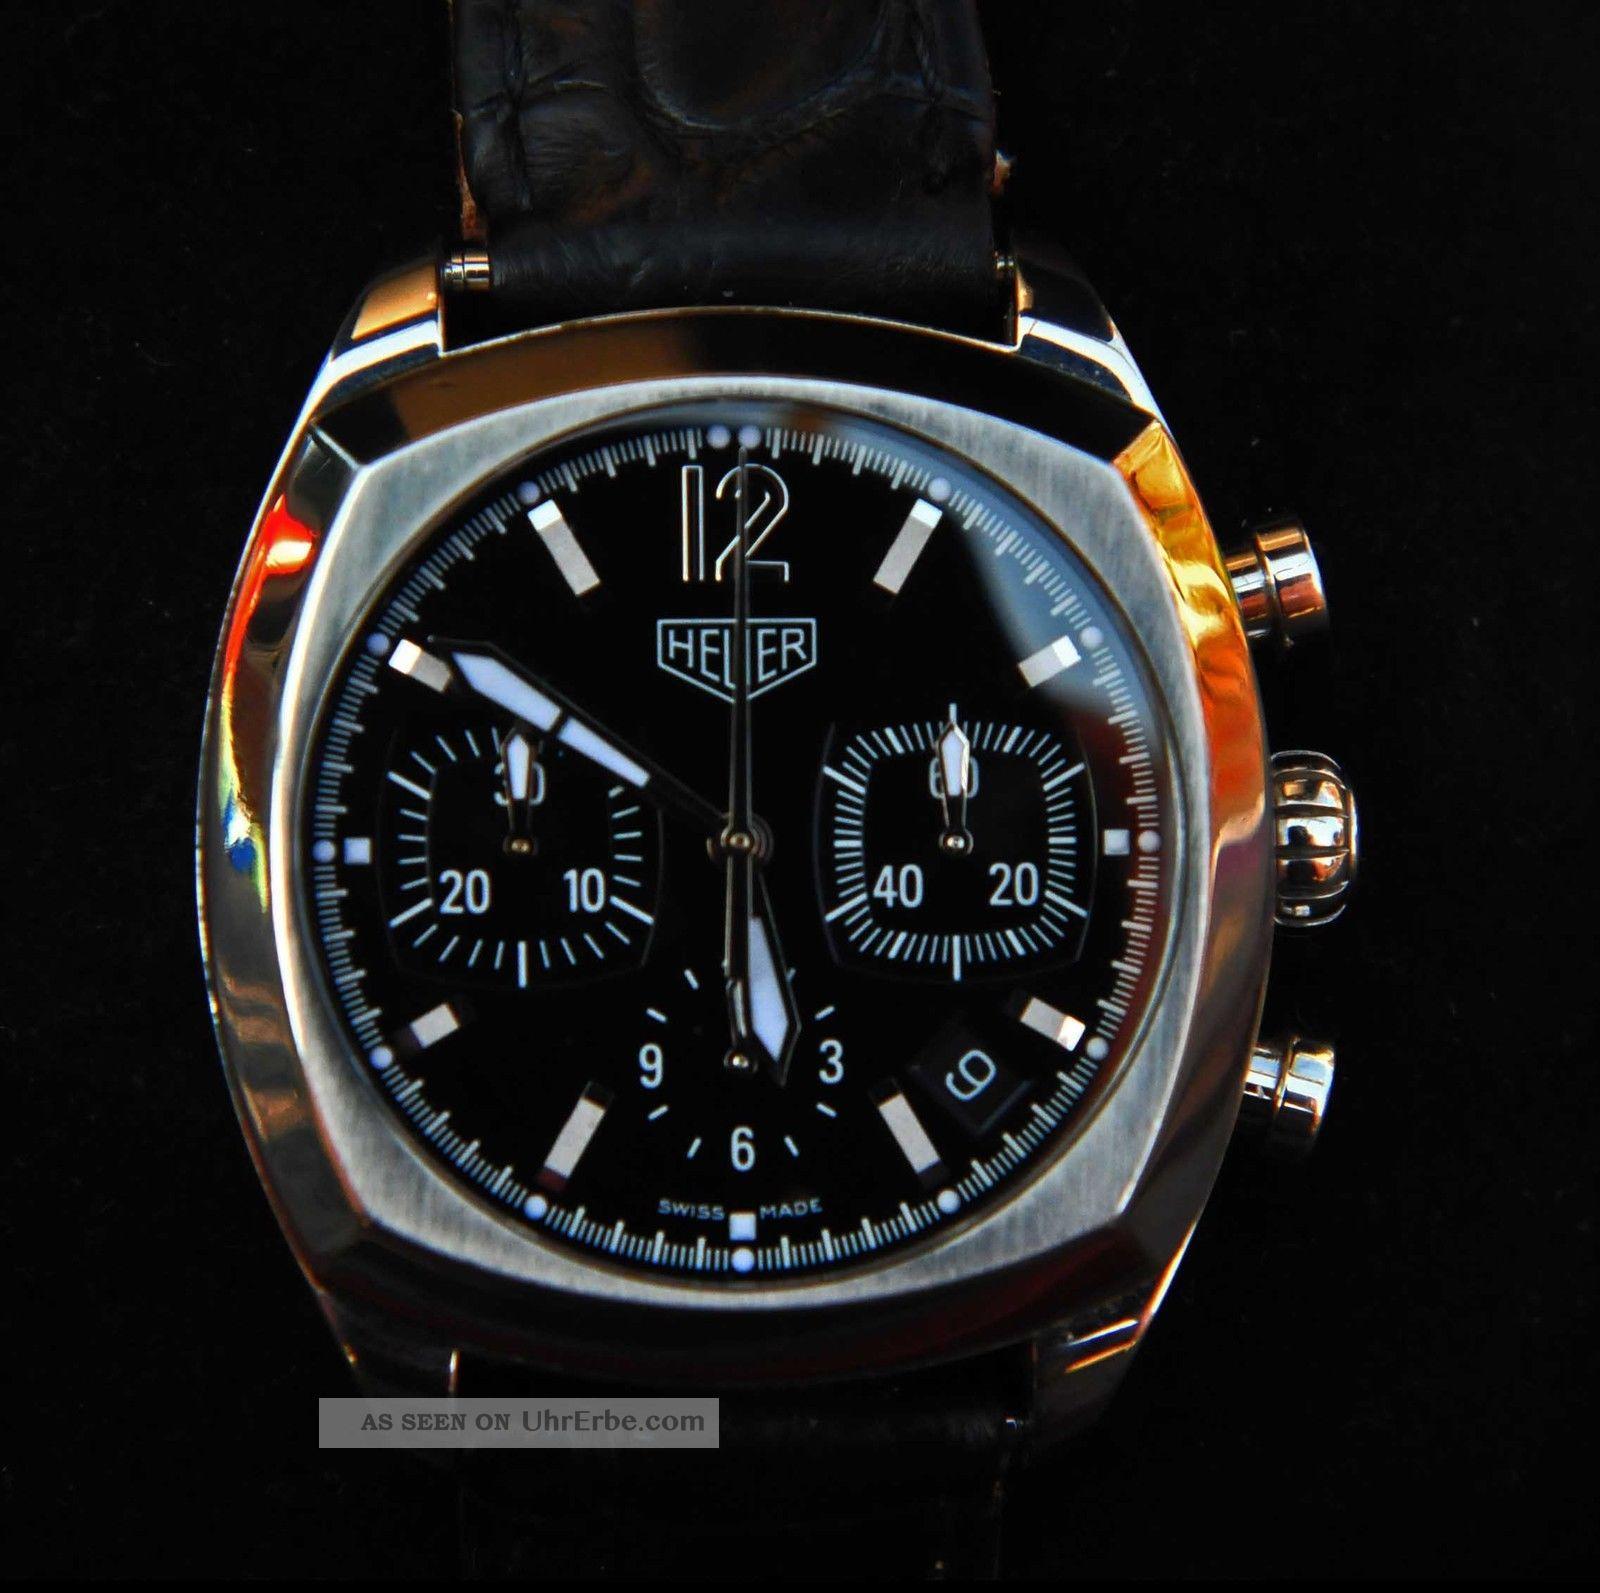 Tag Heuer Monza Calibre 17 Chronograph Cr 2110 Kroko - Faltschließe Armbanduhren Bild